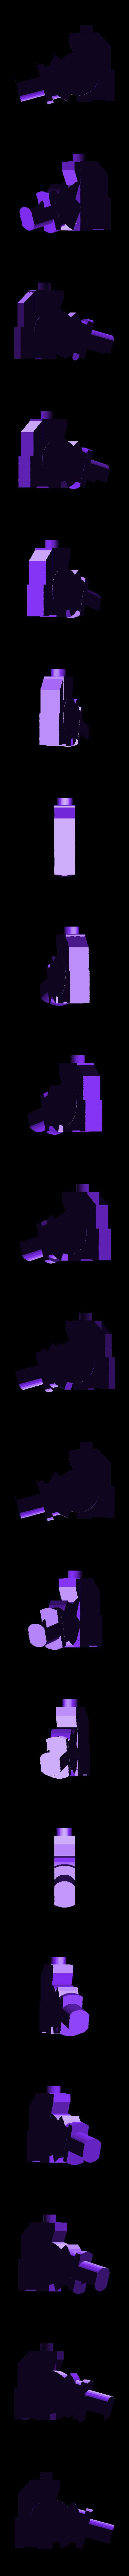 autocannon_center.stl Download free STL file Robot Dread • 3D print template, Mazer